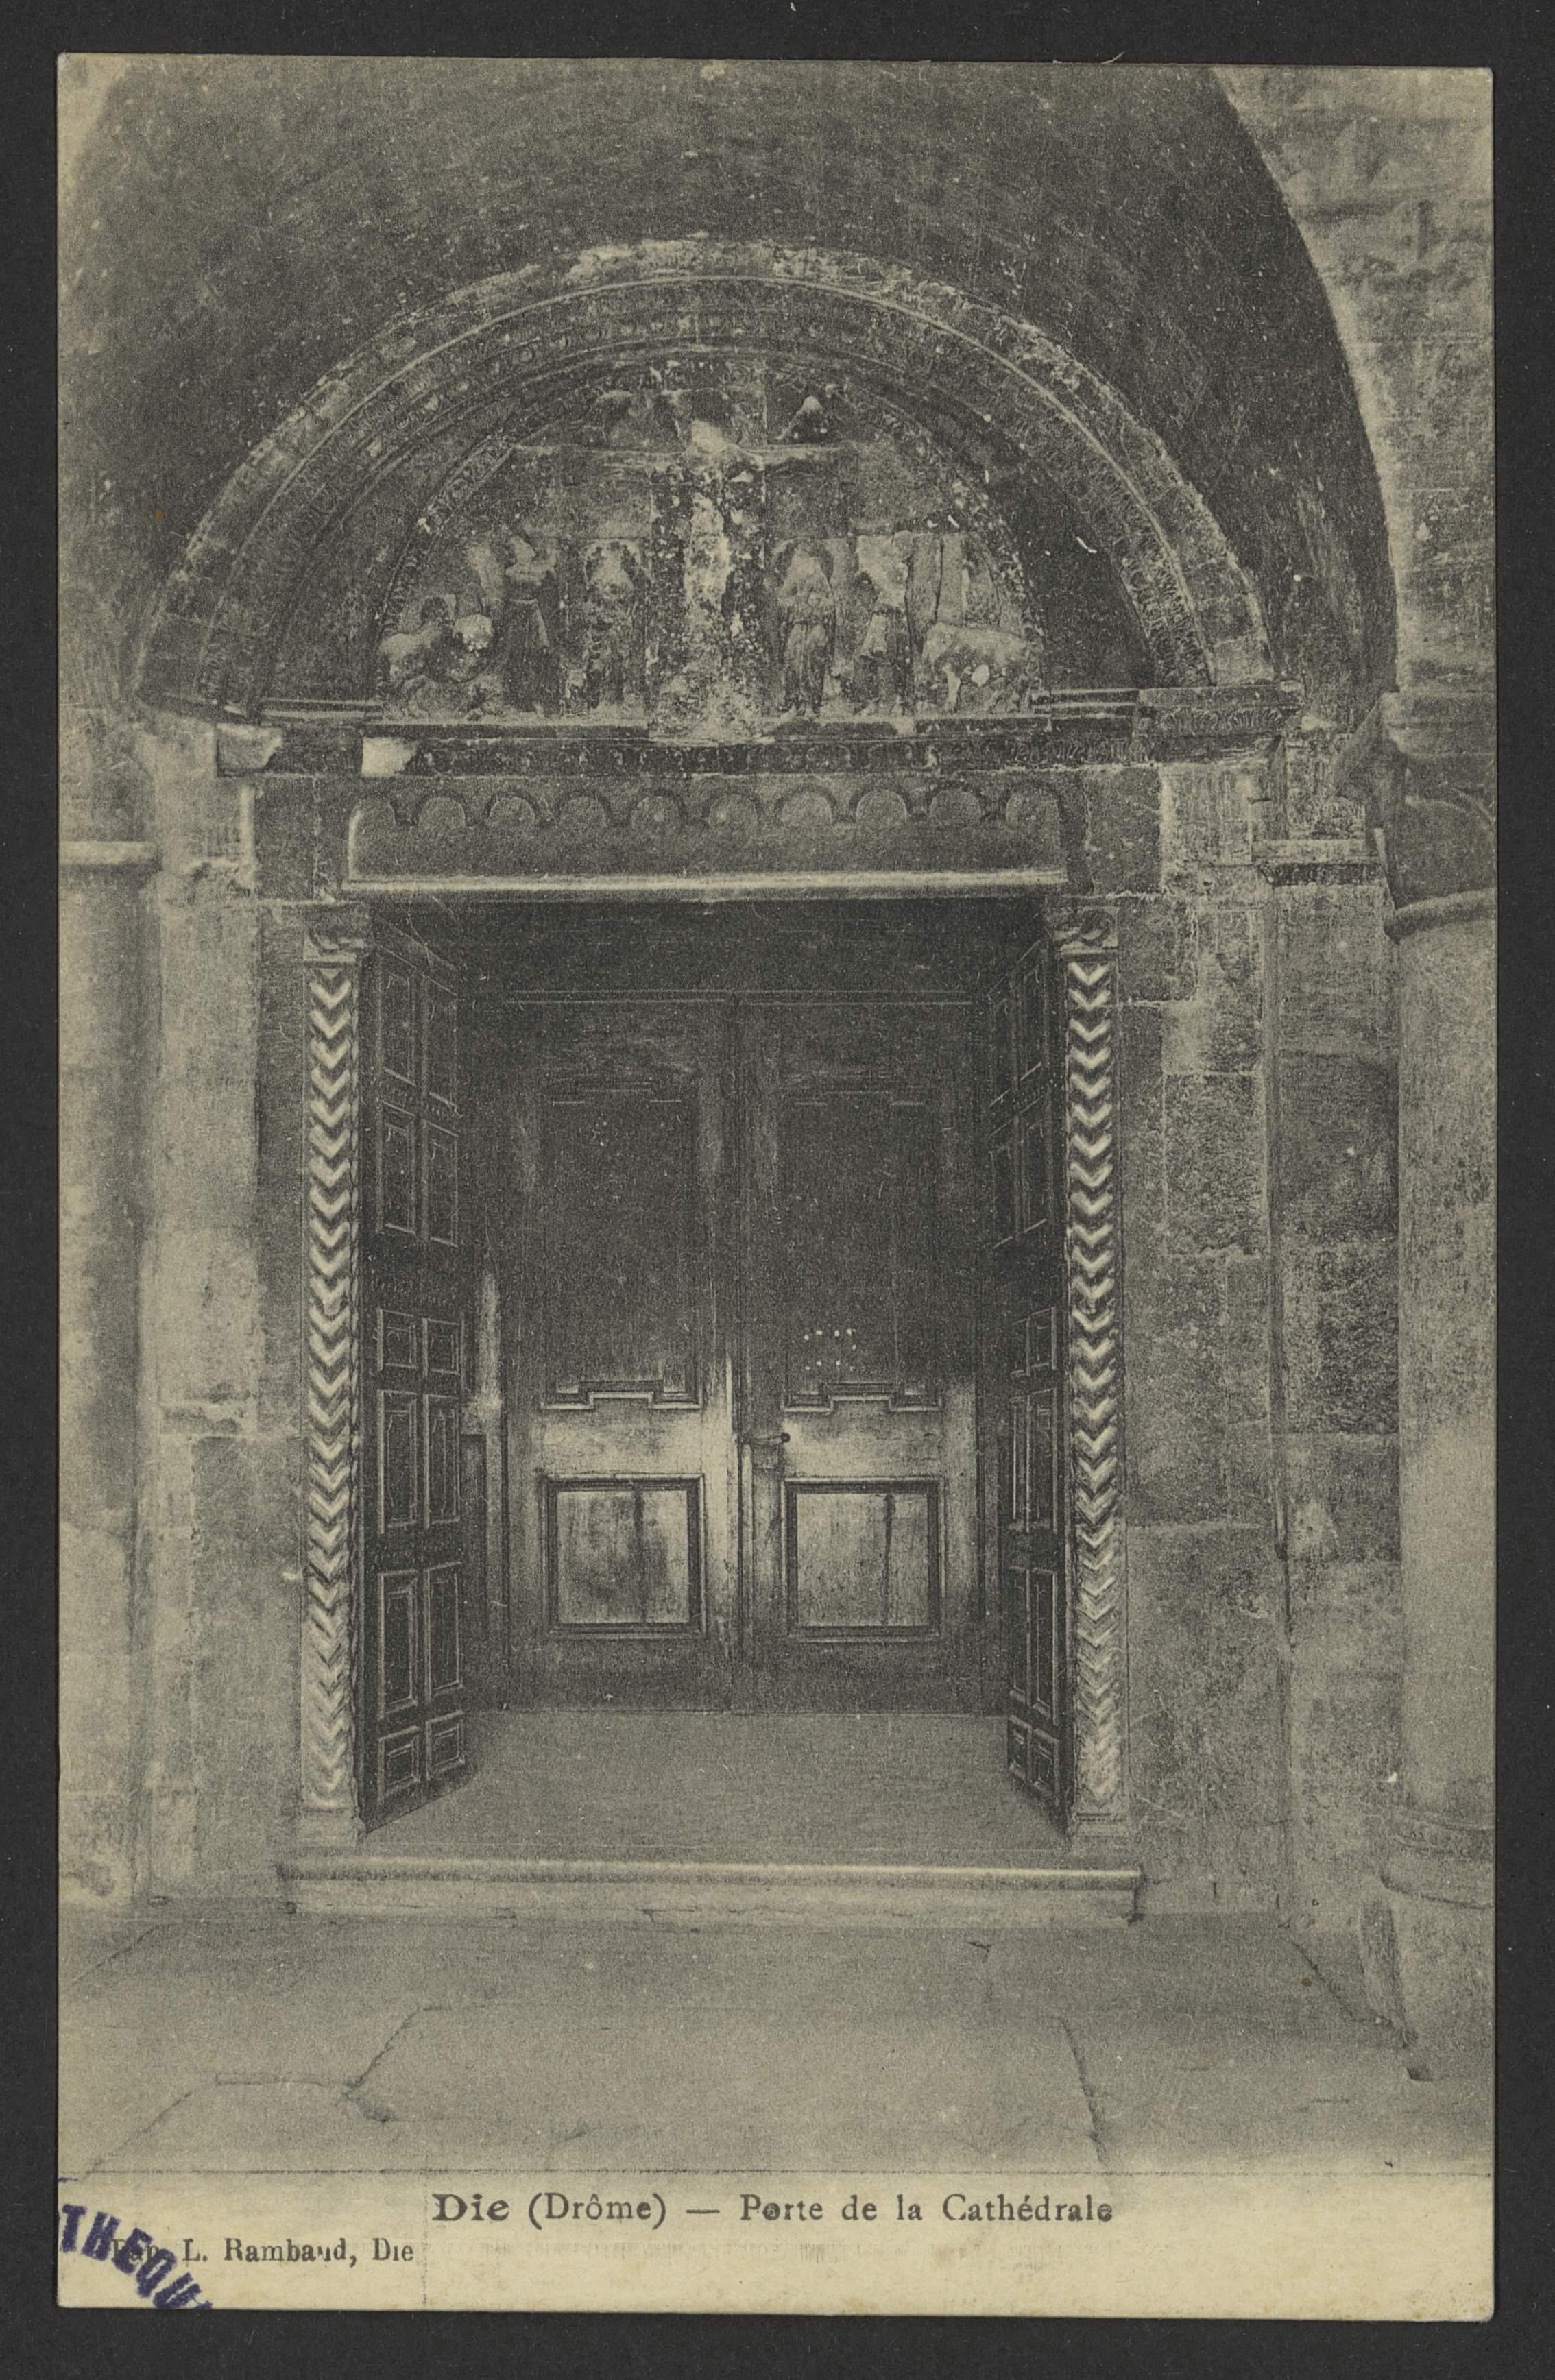 Die (Drôme) - Porte de la Cathédrale